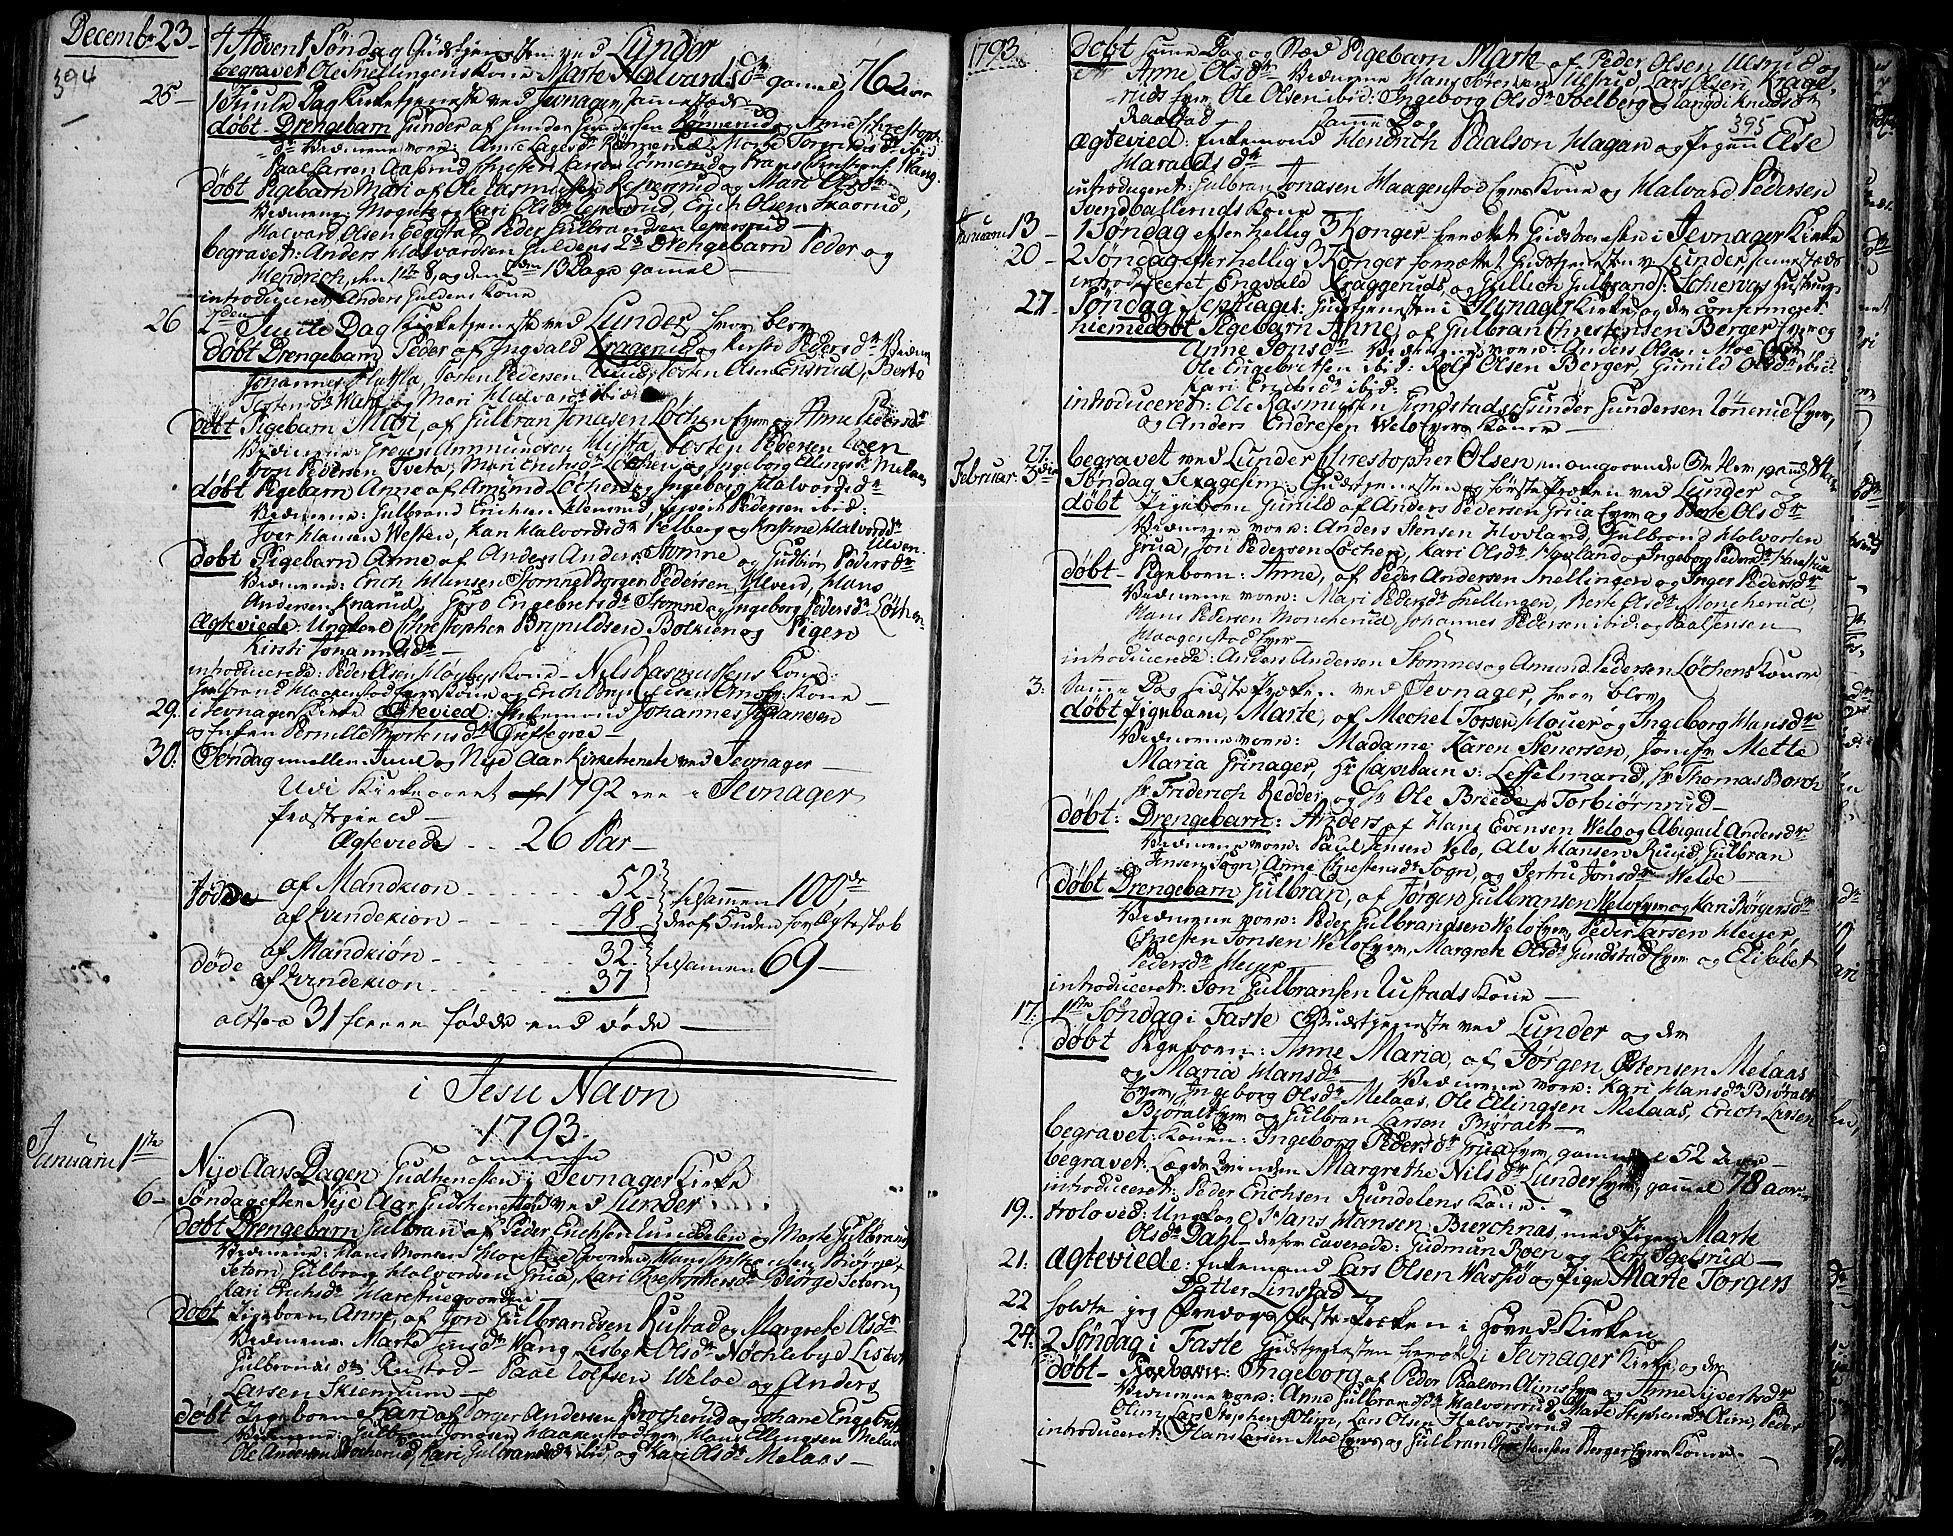 SAH, Jevnaker prestekontor, Ministerialbok nr. 3, 1752-1799, s. 394-395